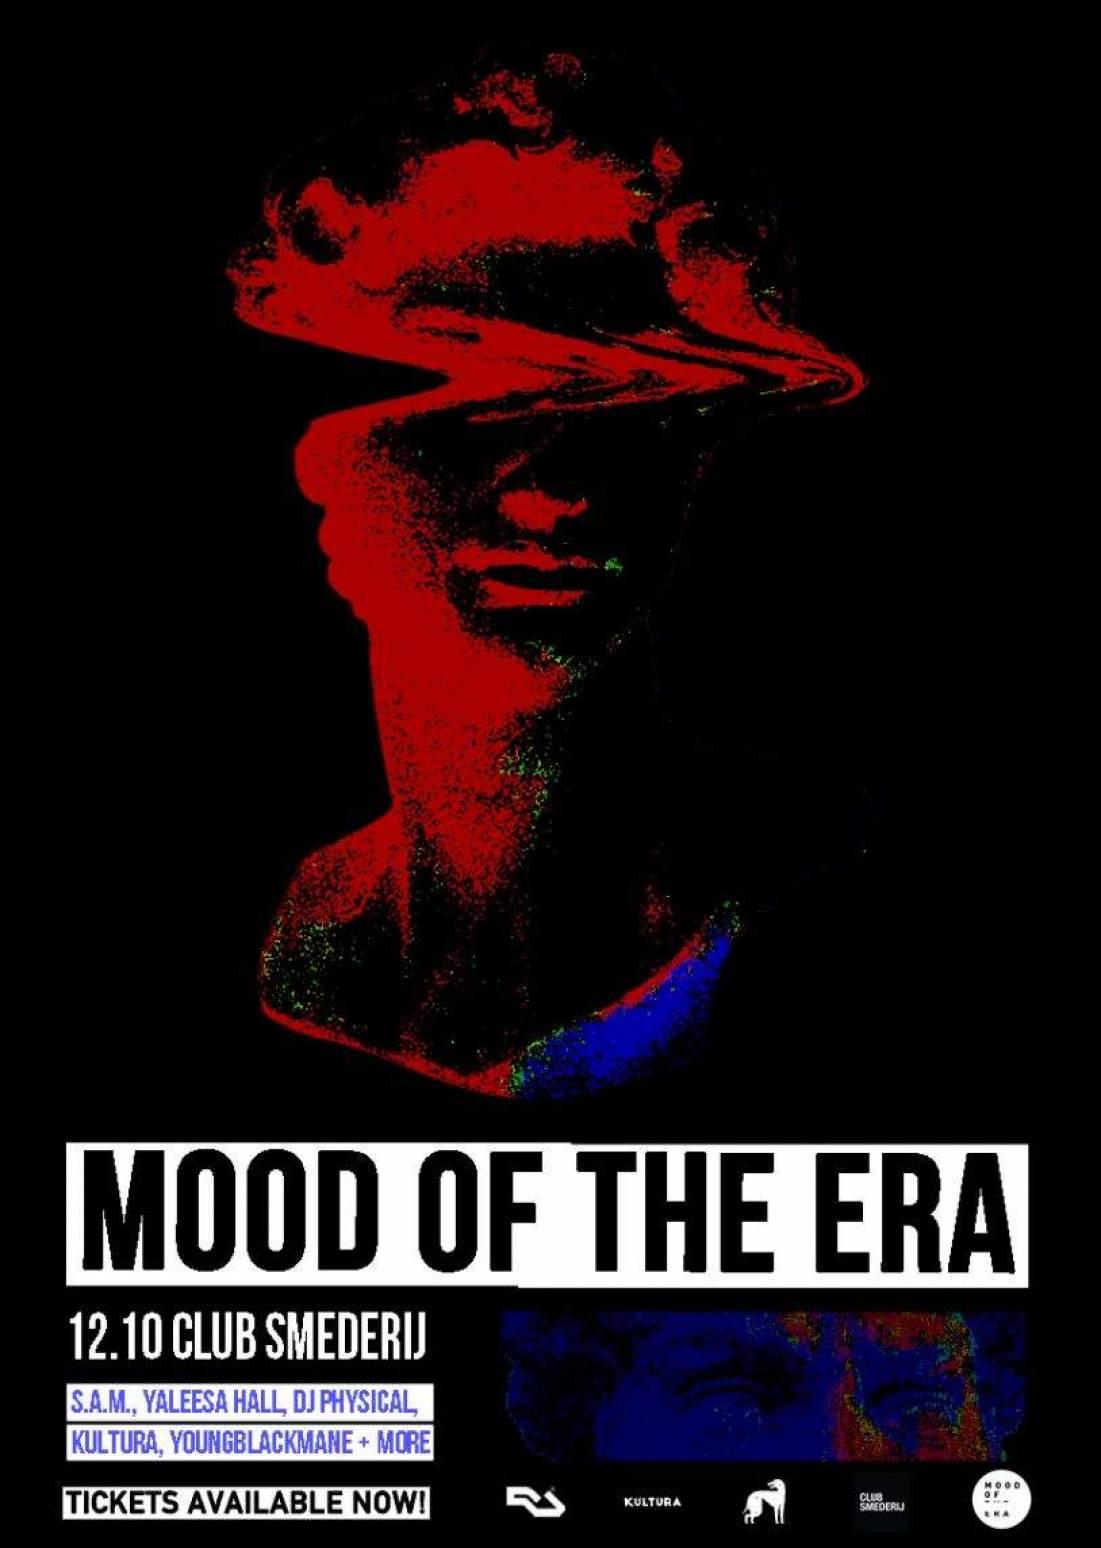 Mood Of The Era